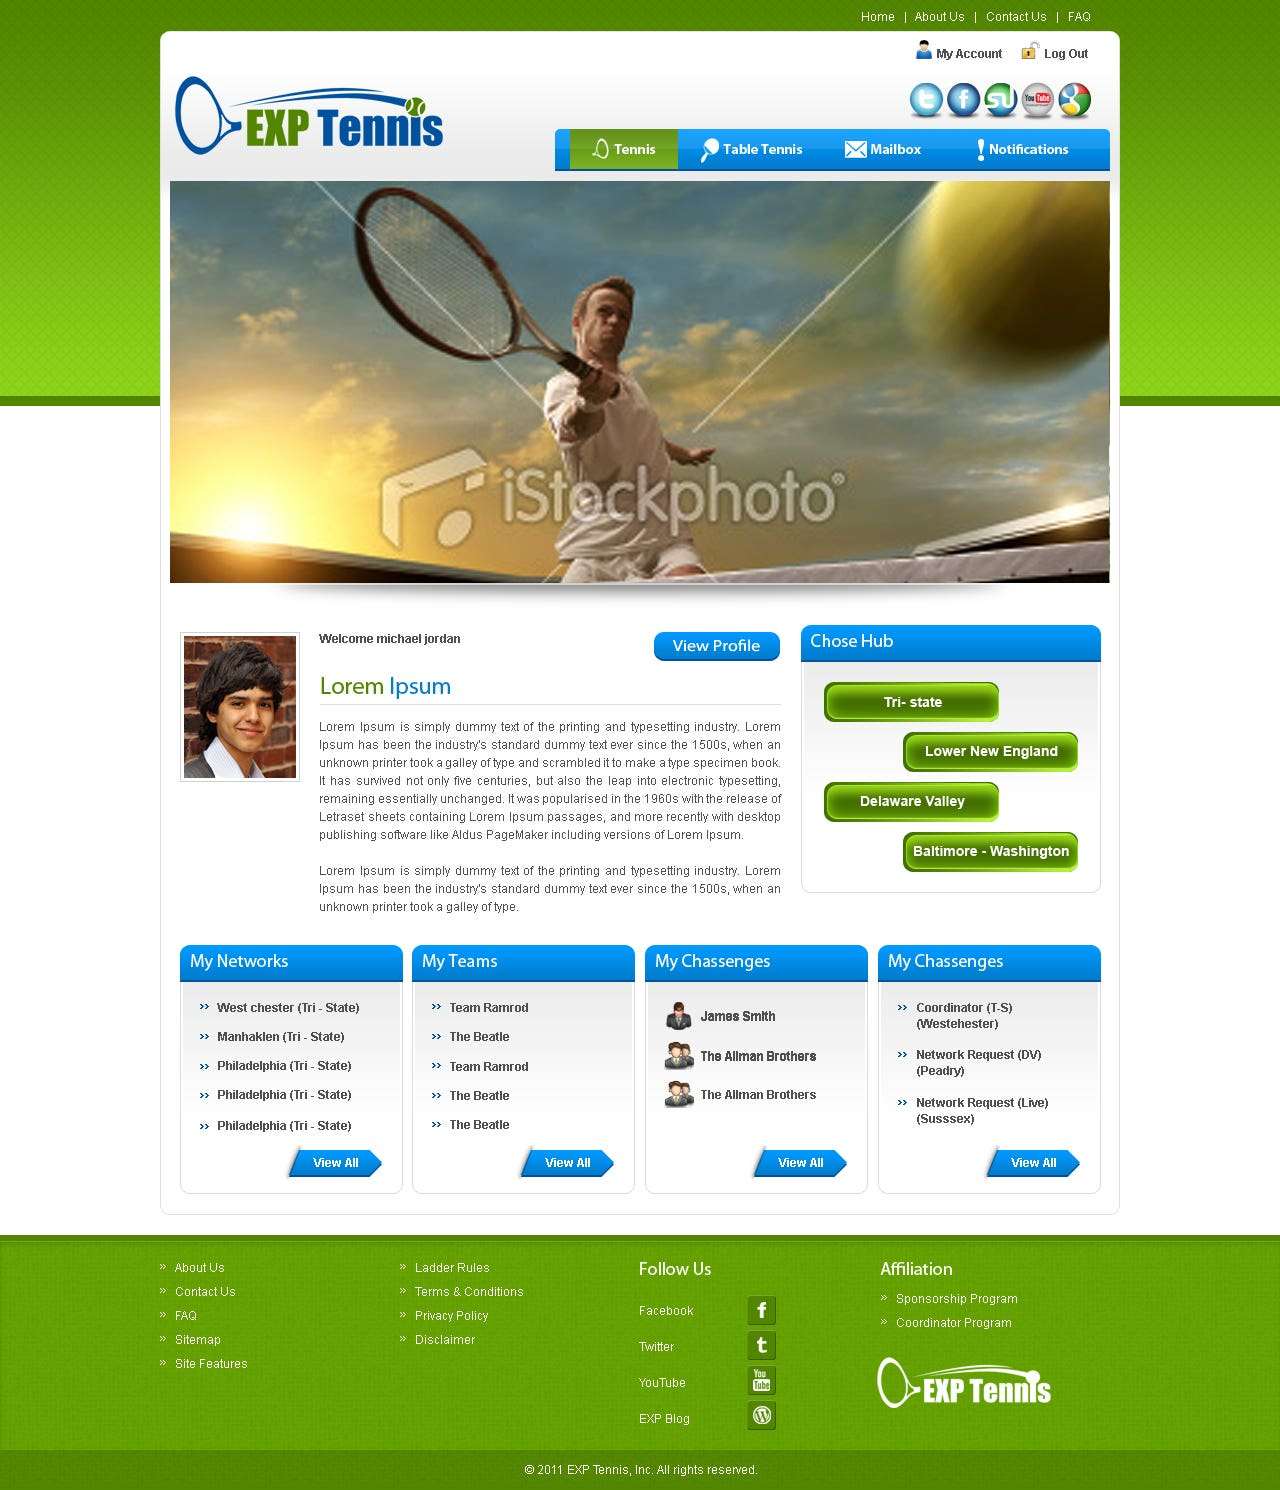 EXP Tennis